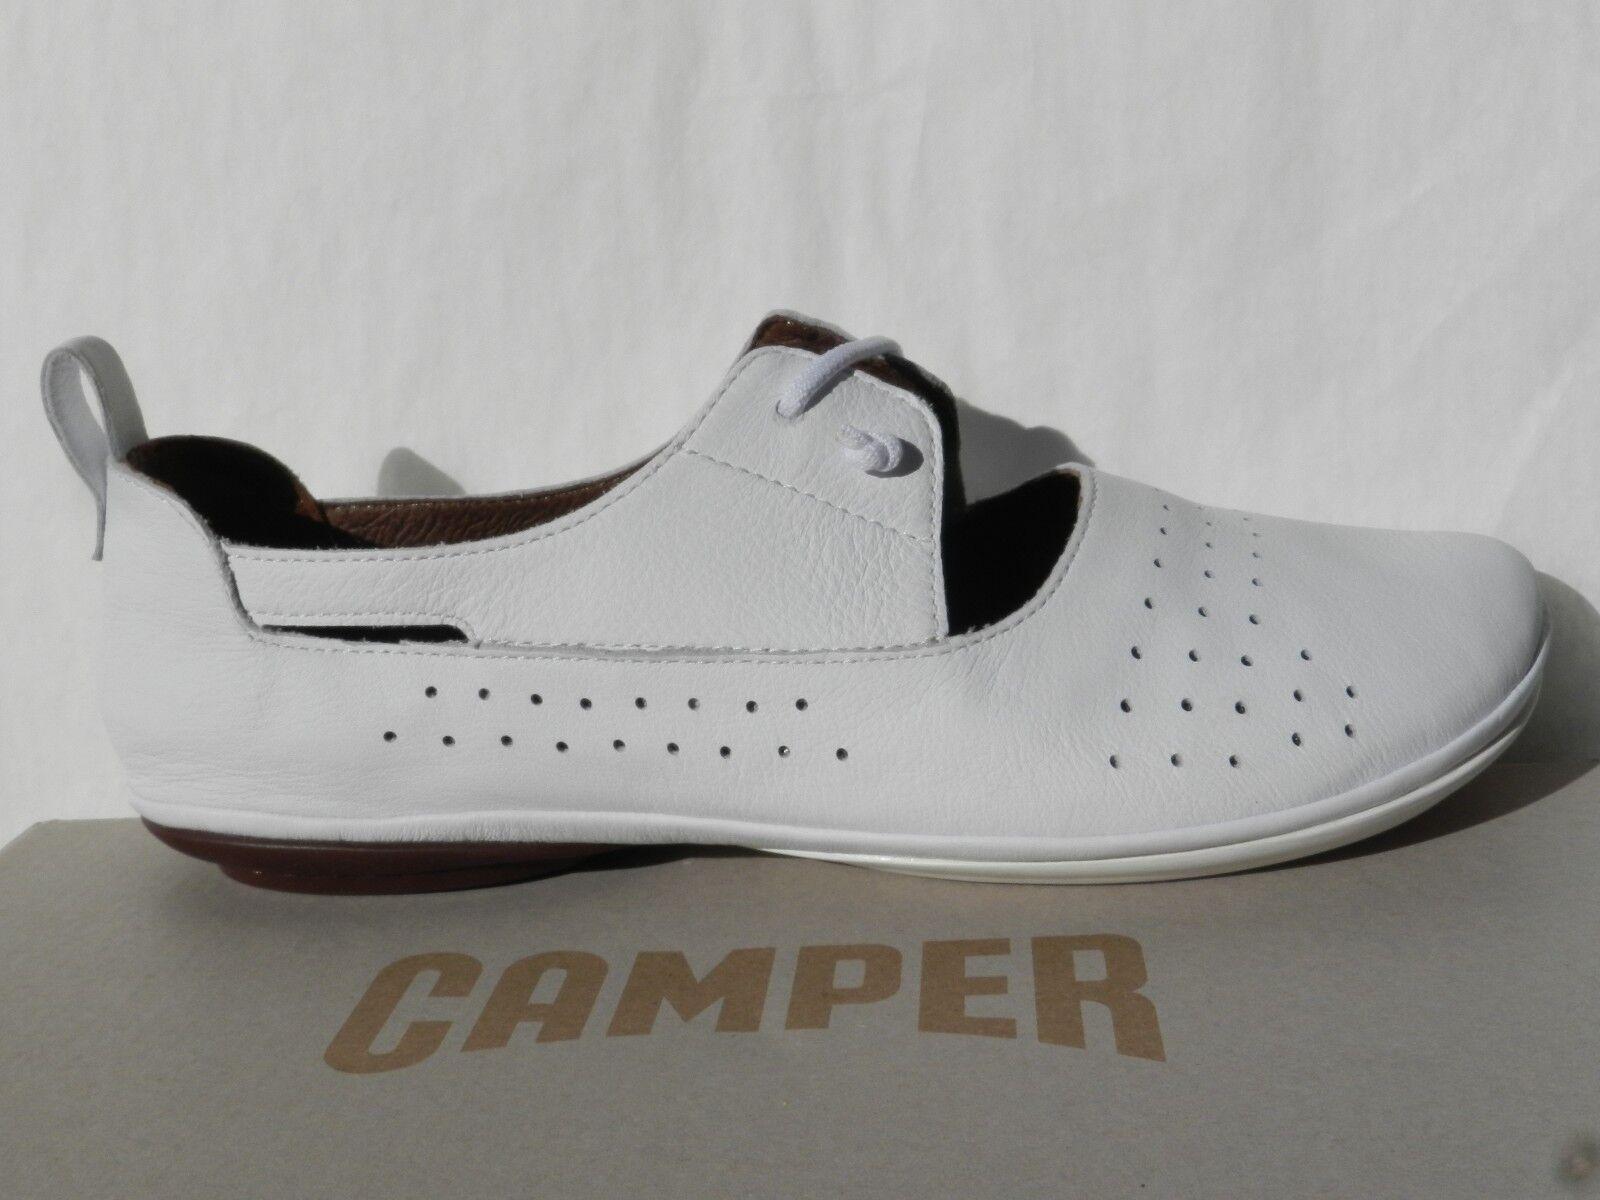 Camper Right Nina Sautope Donna 40 Btuttierine Bianco Slip in K200441 Nuovo UK7